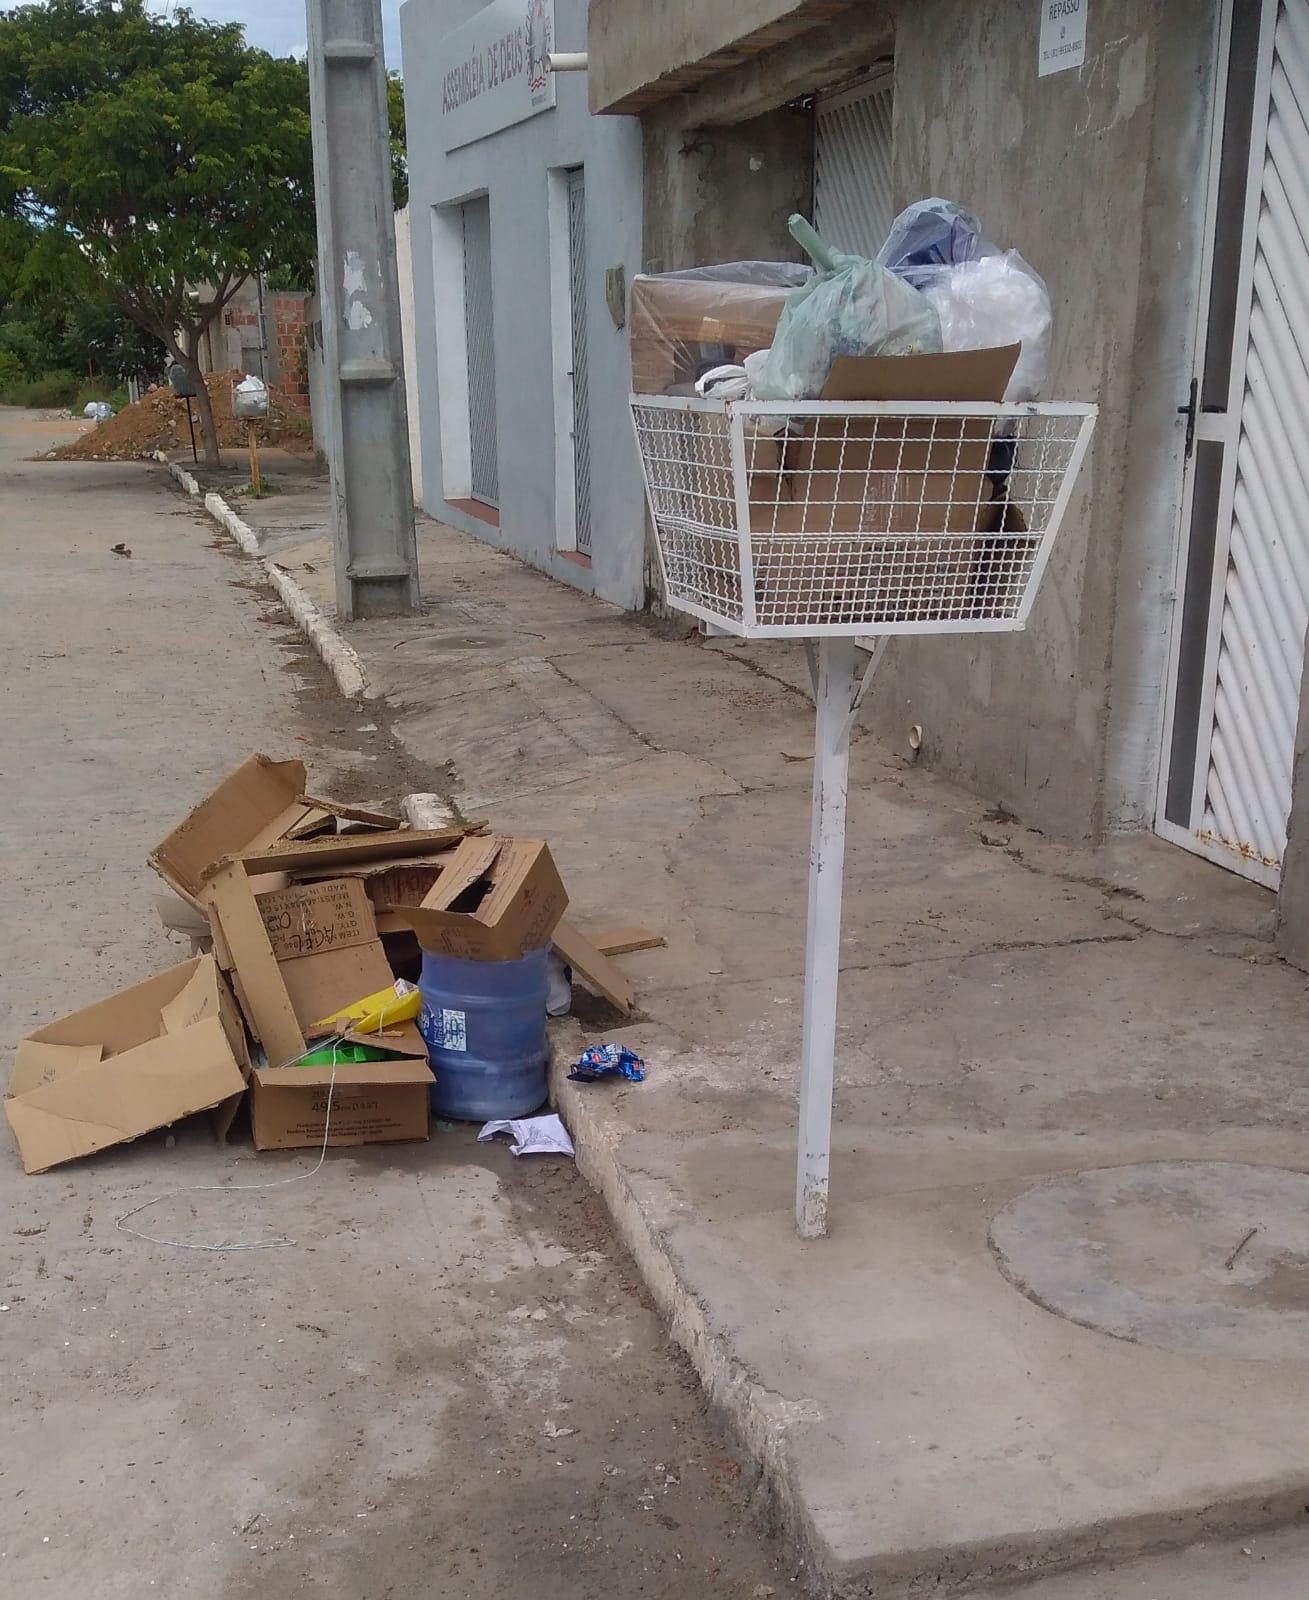 Demora na coleta de lixo gera queixa de morador do Viana & Moura